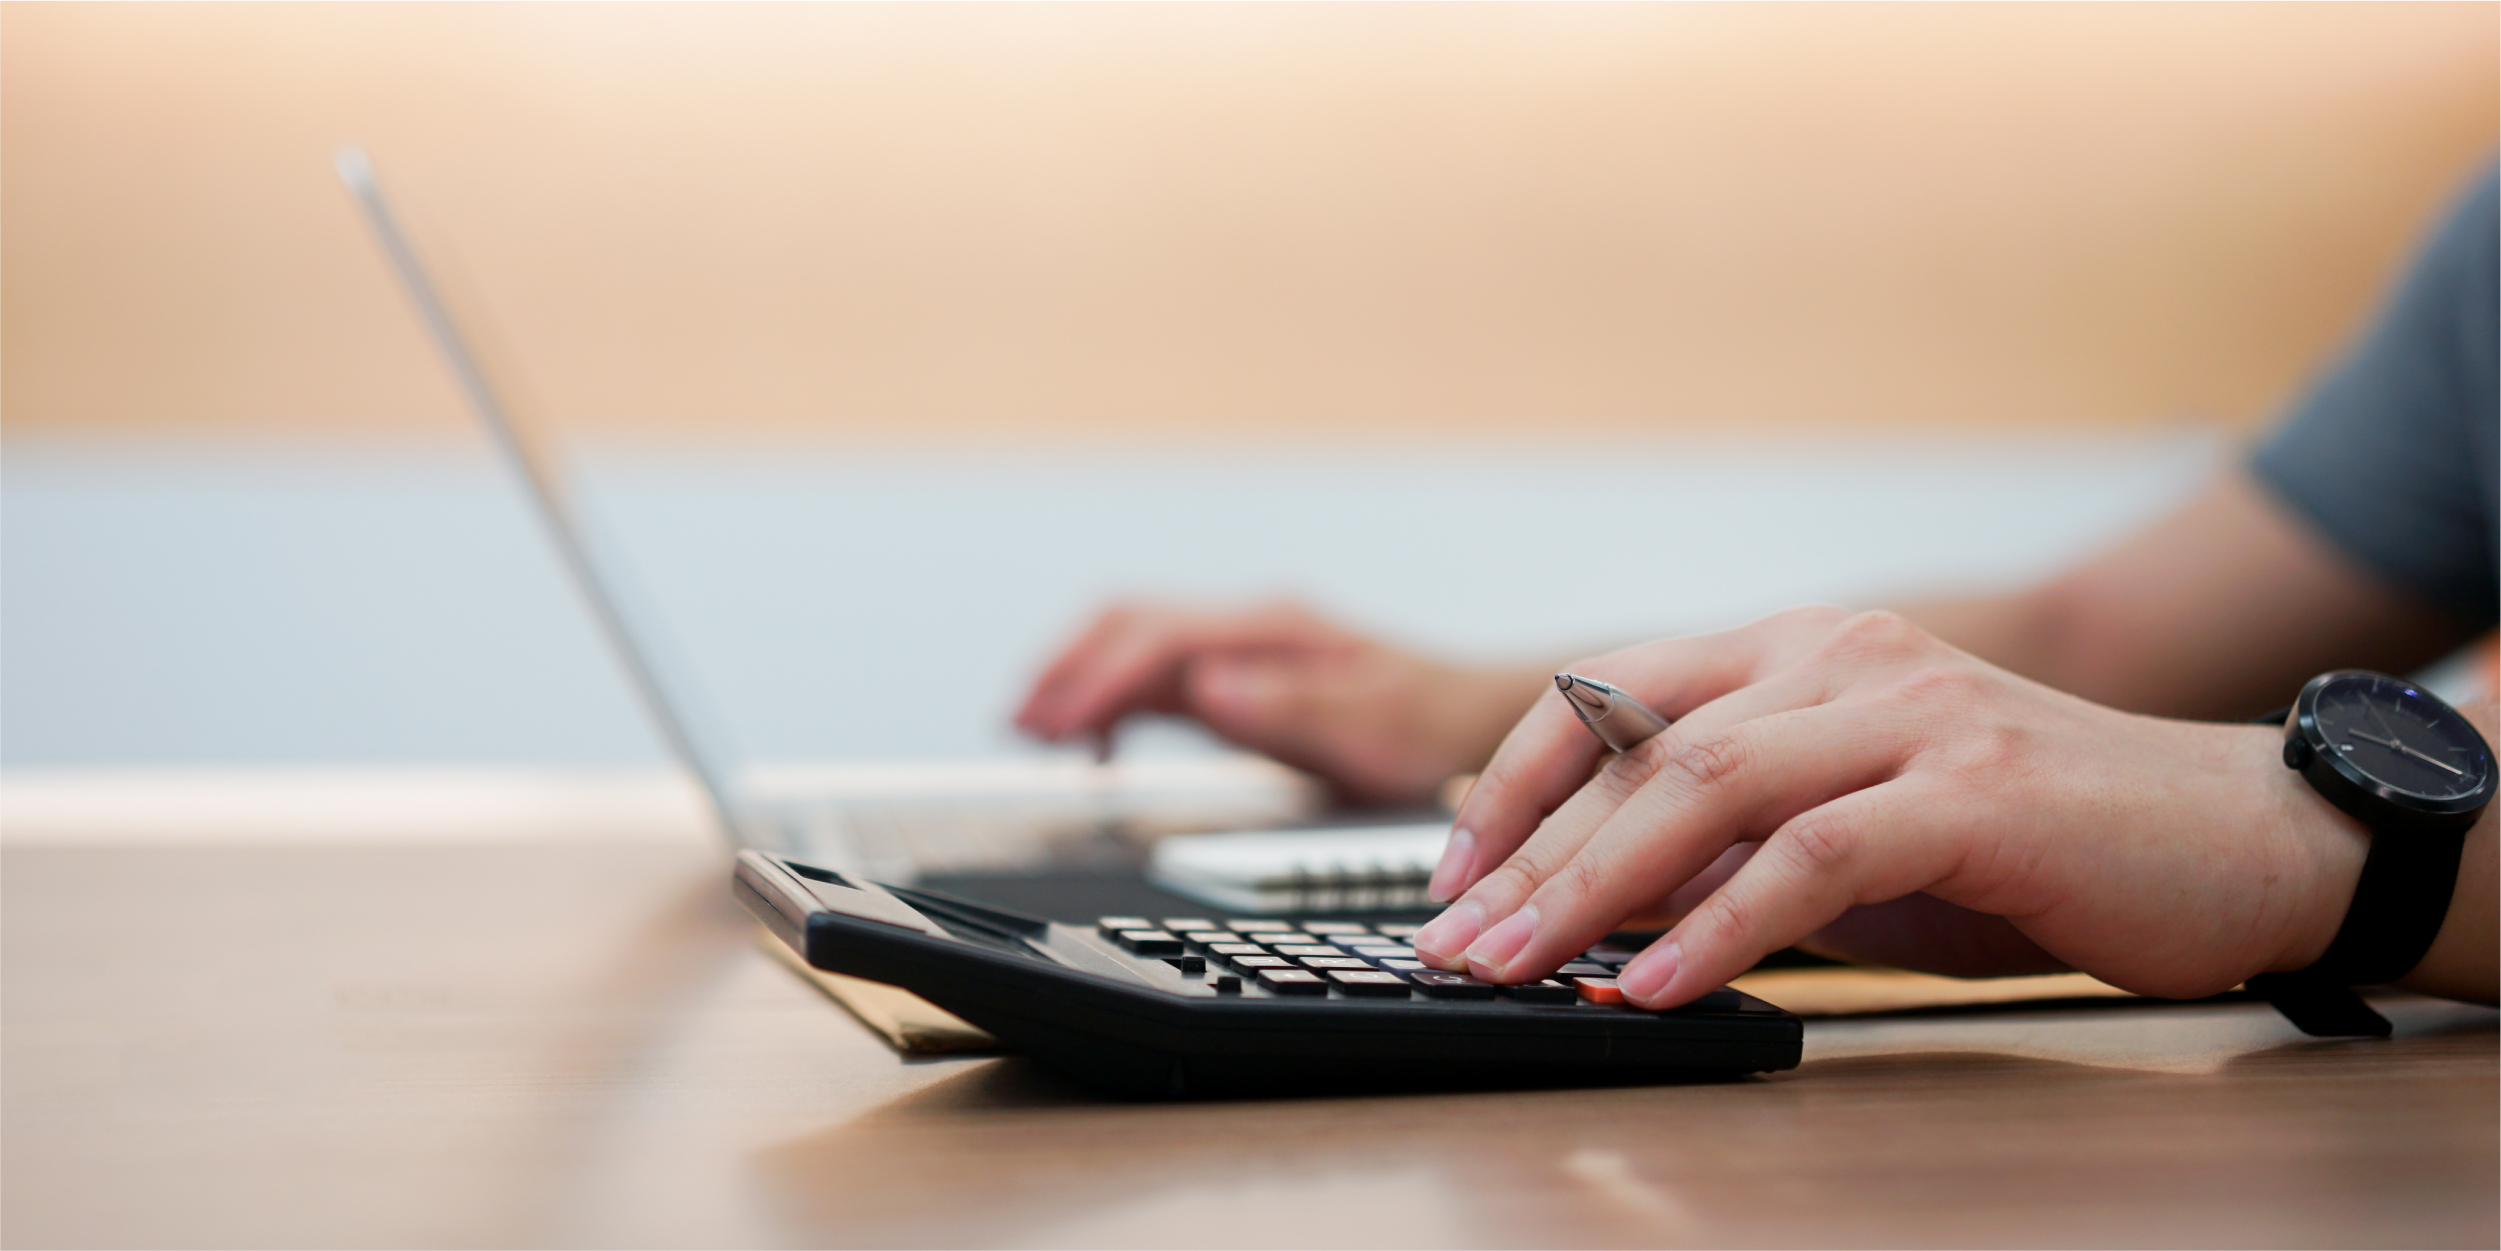 accountant-employee-man-hand-pressing-calculator-typing-keyboard-laptop_Blog copy